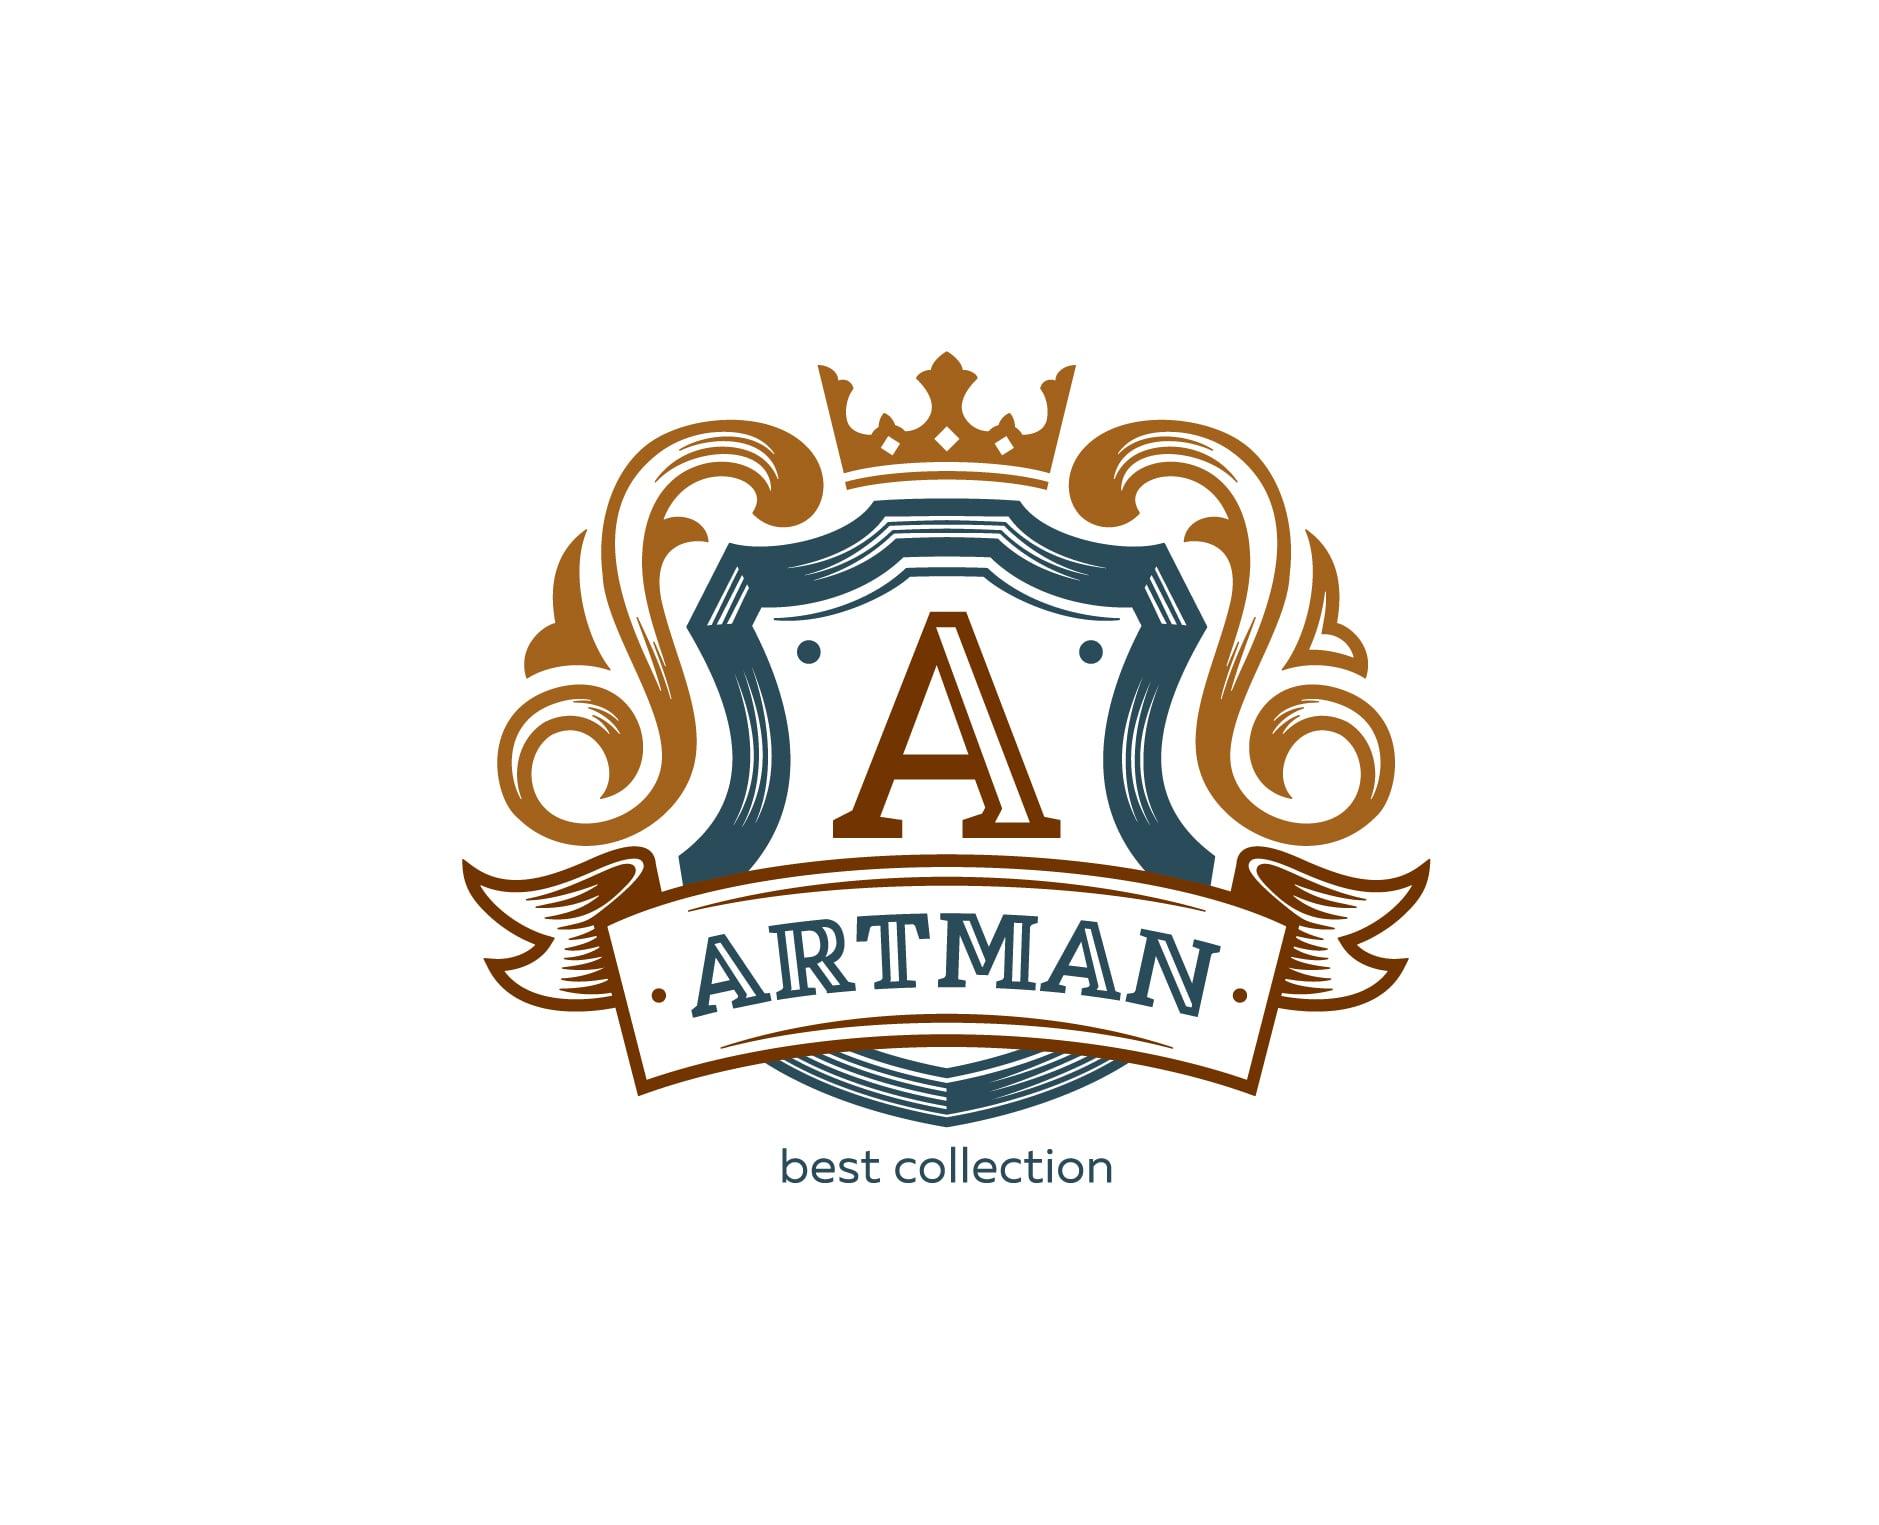 ARTMAN